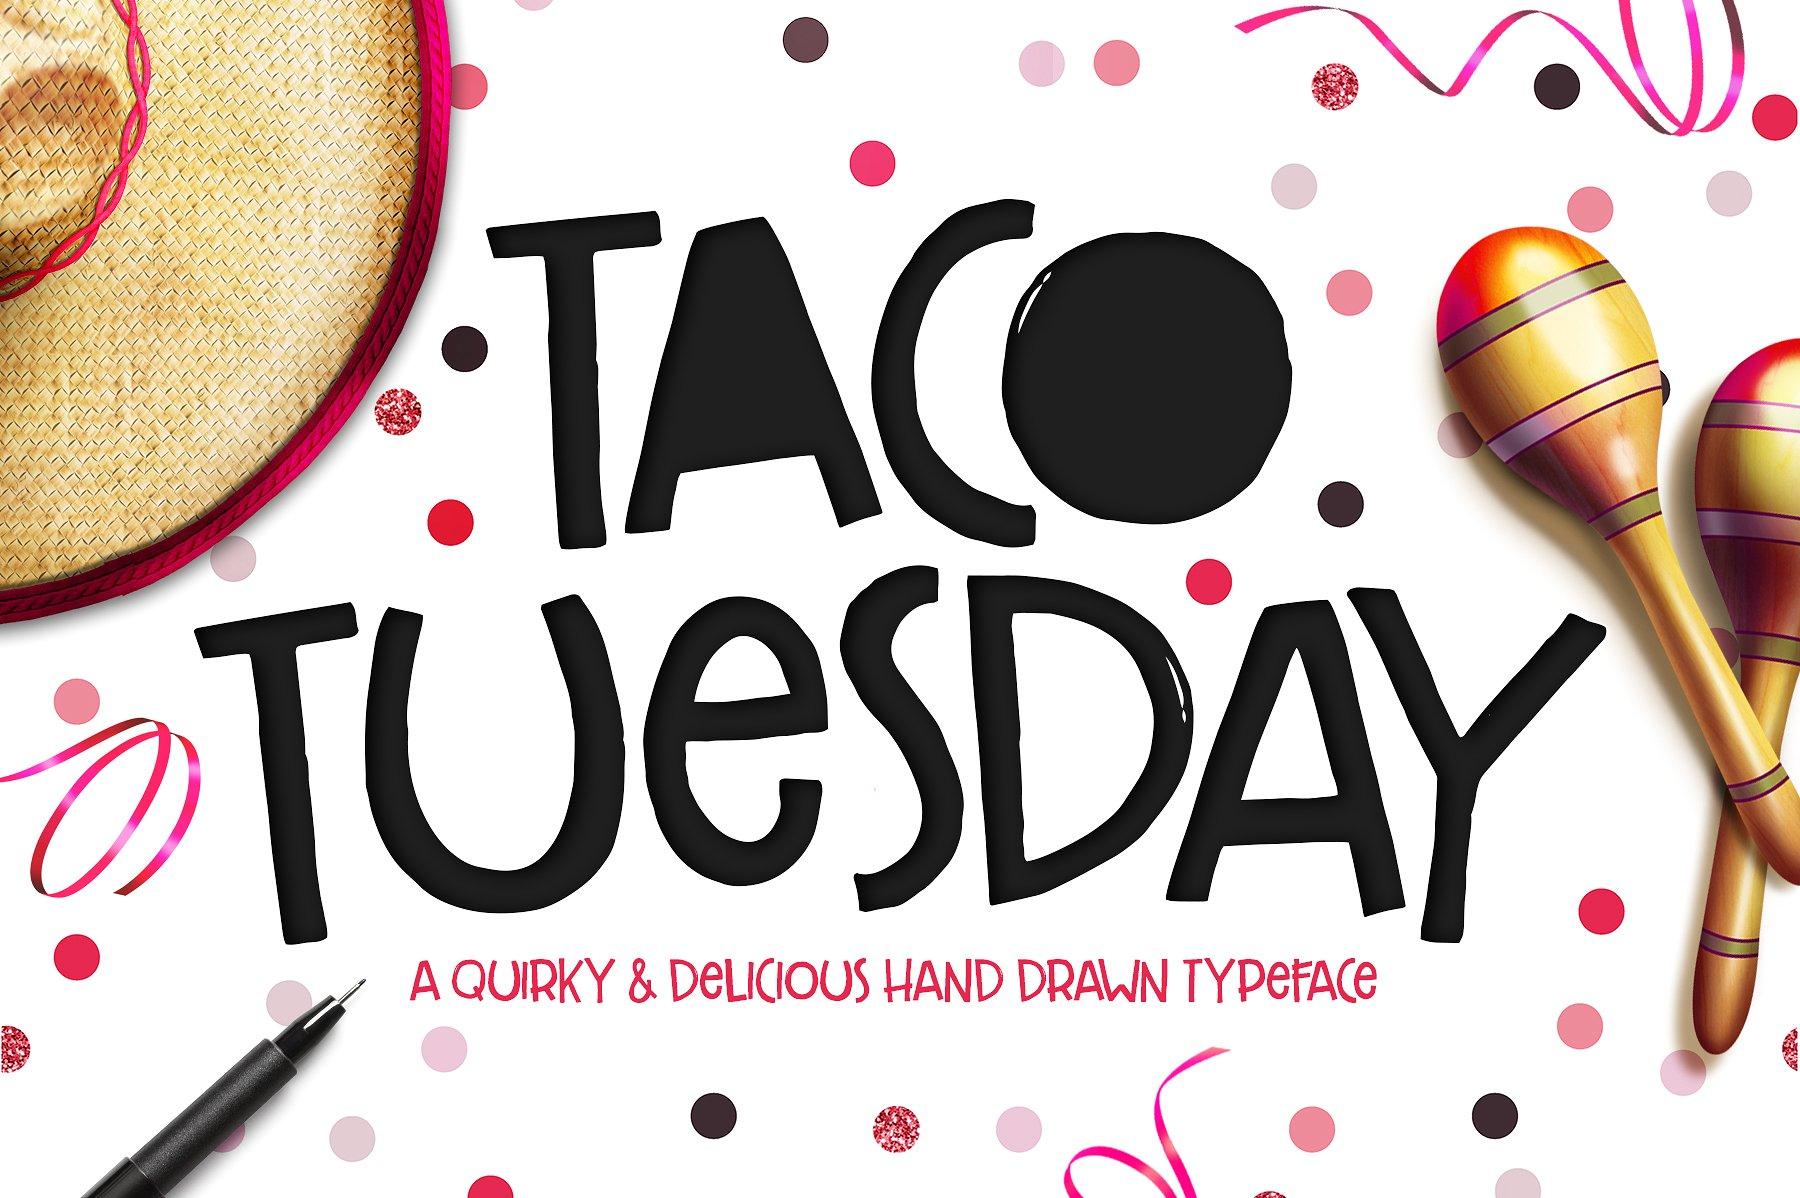 Drawn tacos delicious  Market Creative Typeface ~